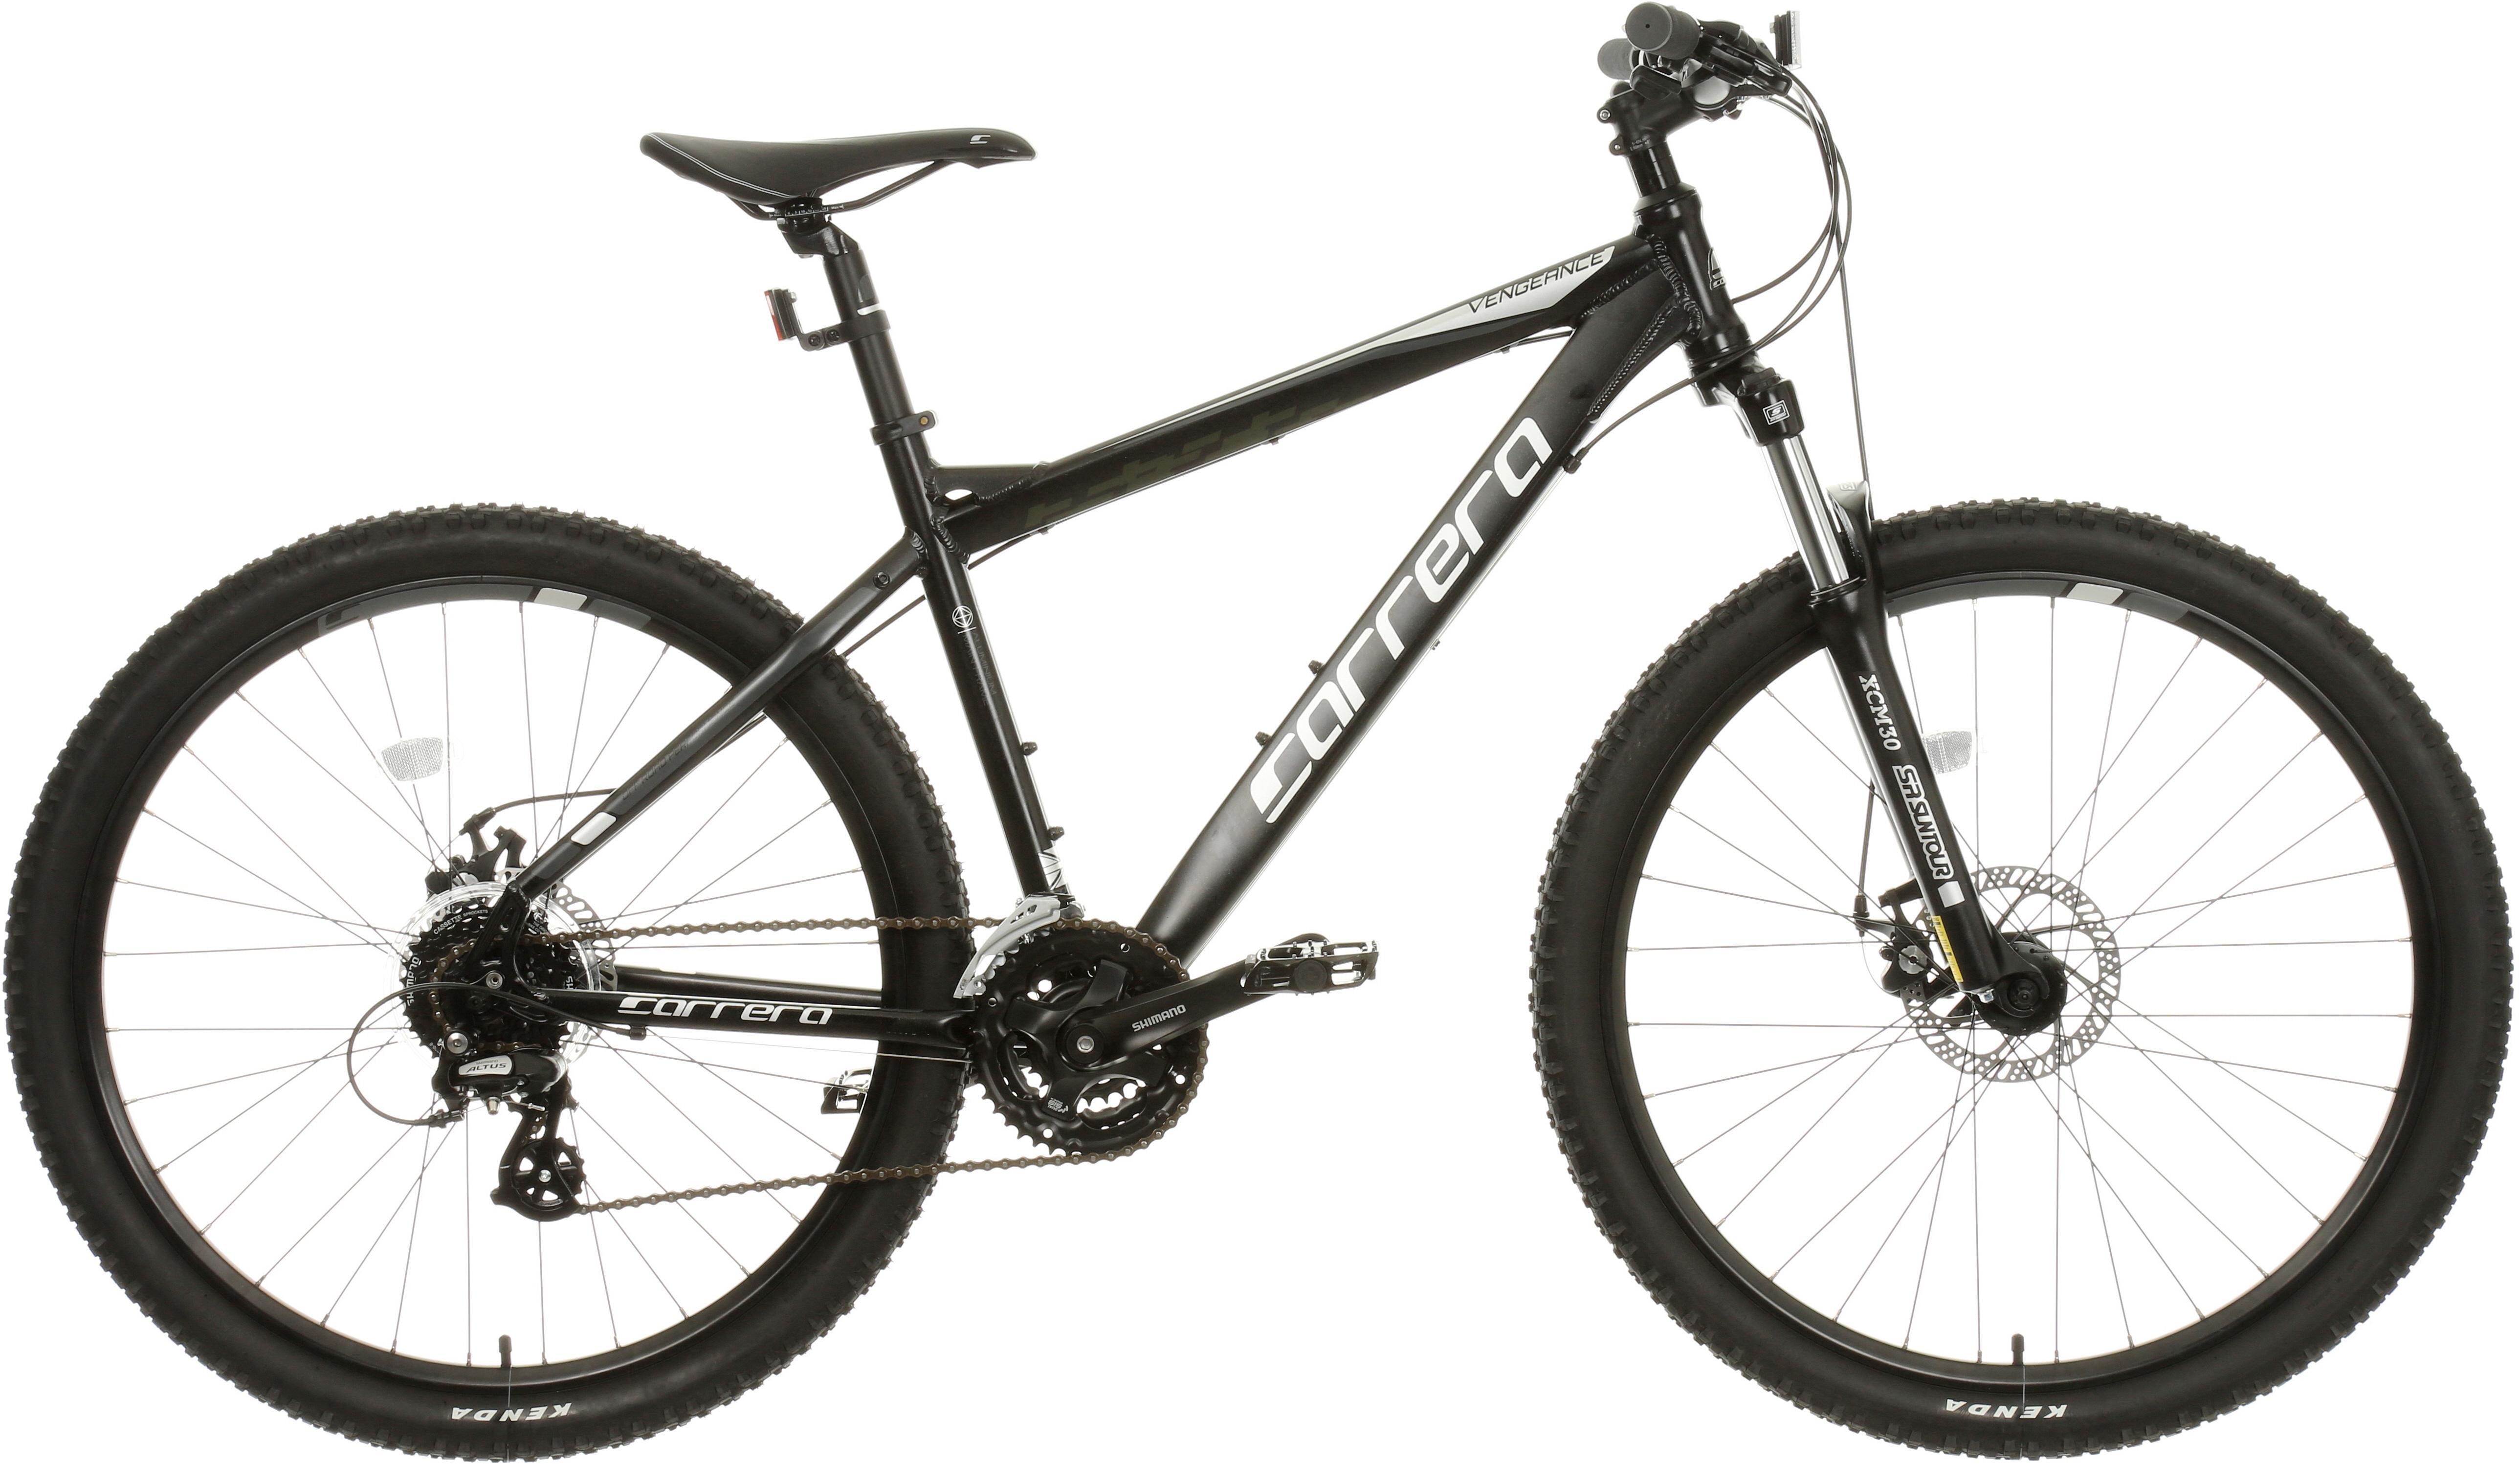 Carrera Vengeance Mens Mountain Bike - Black, L